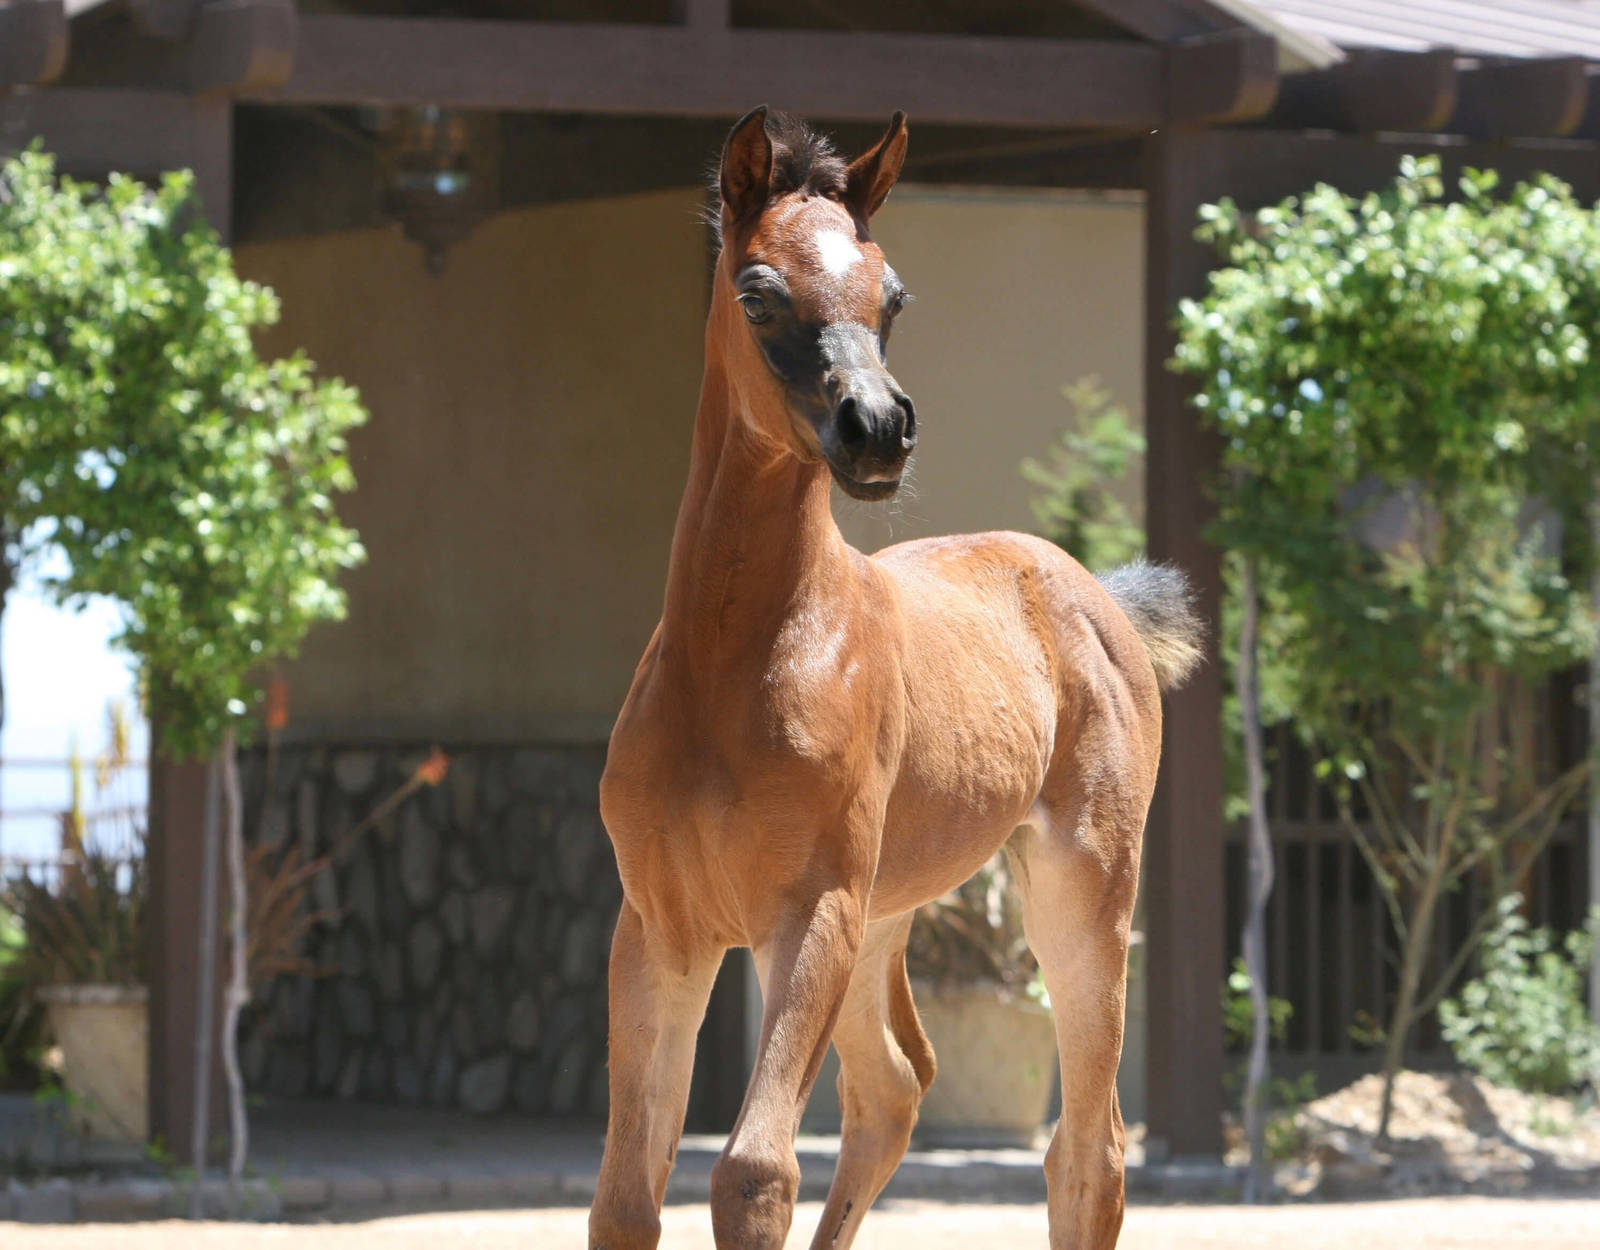 Azpin Lia - age 4 weeks